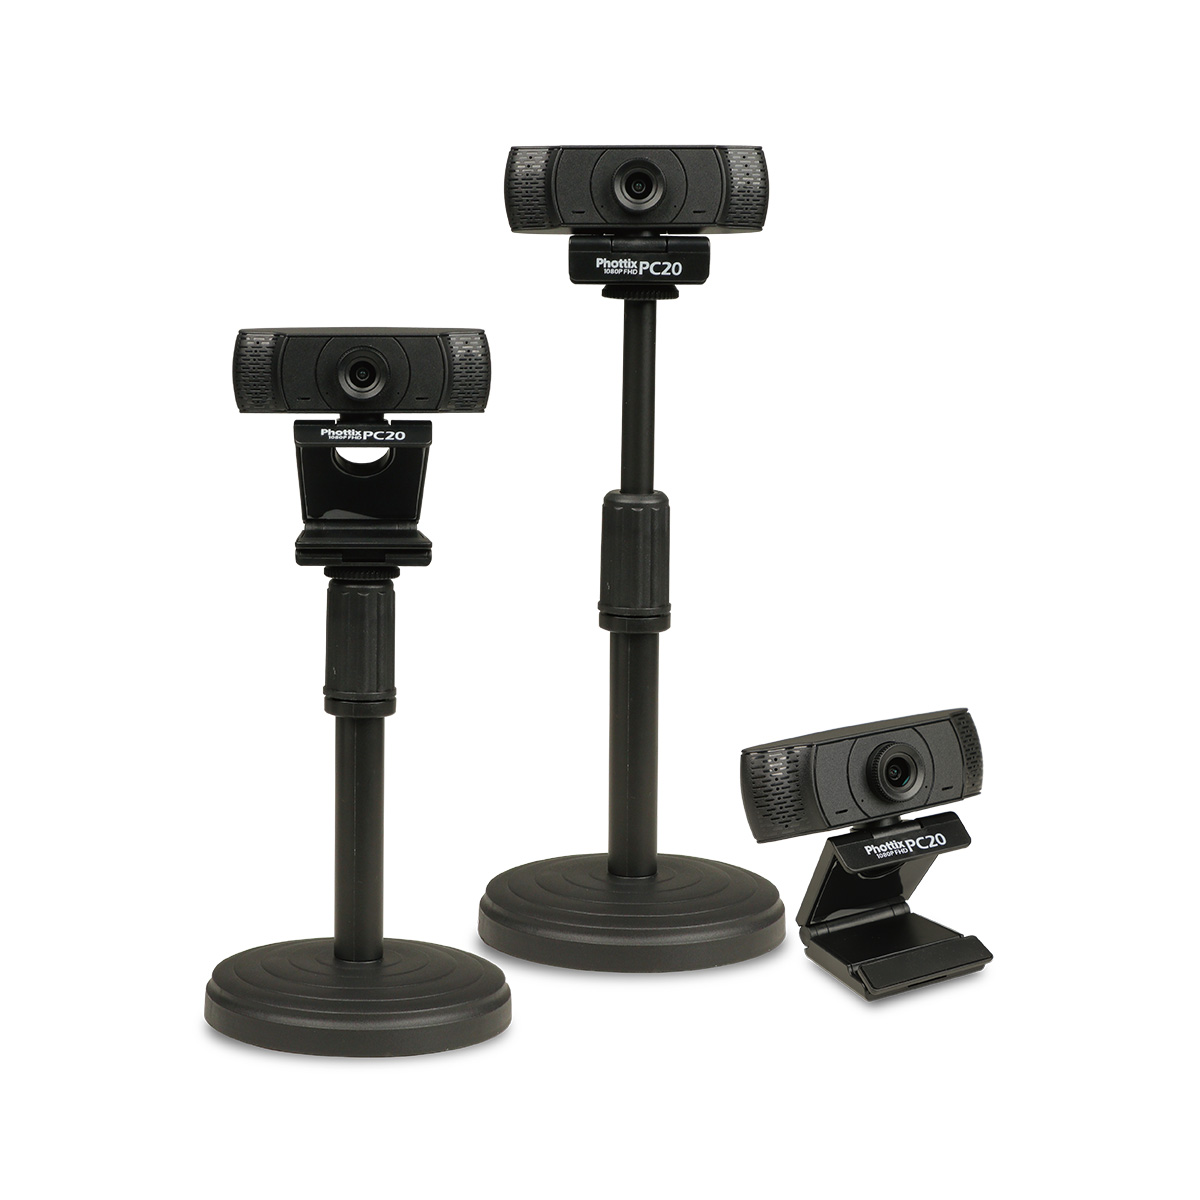 PC-20 FHD Webcam